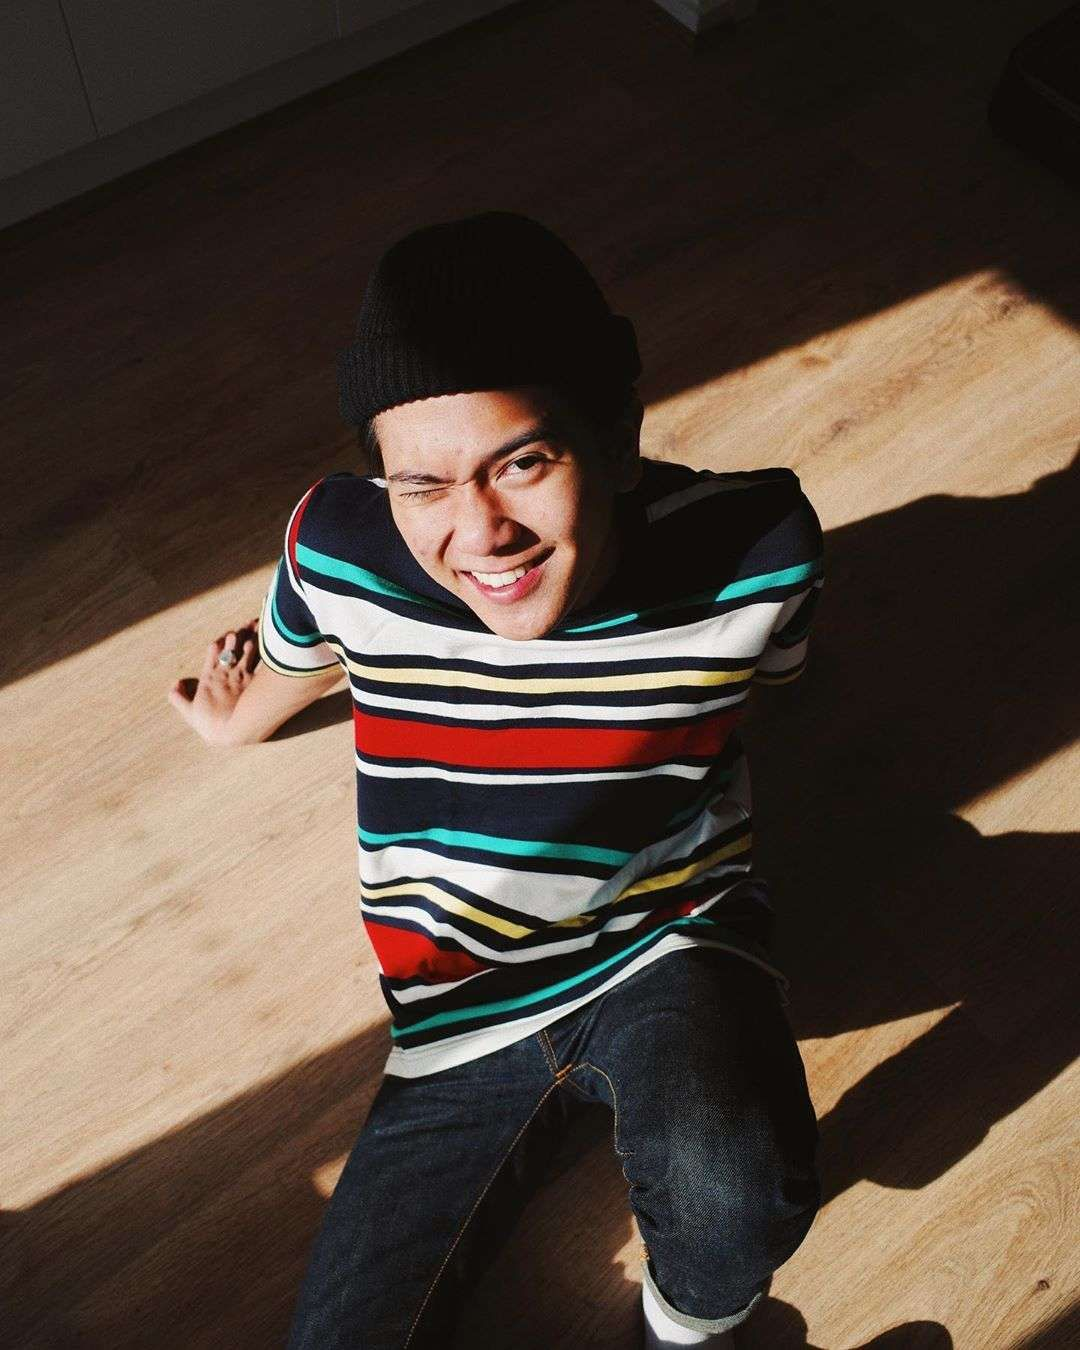 Multitalenta Banget 10 Seleb Ini Bisa Nyanyi Sekaligus Akting Foto Teman Fotografi Remaja Fotografi